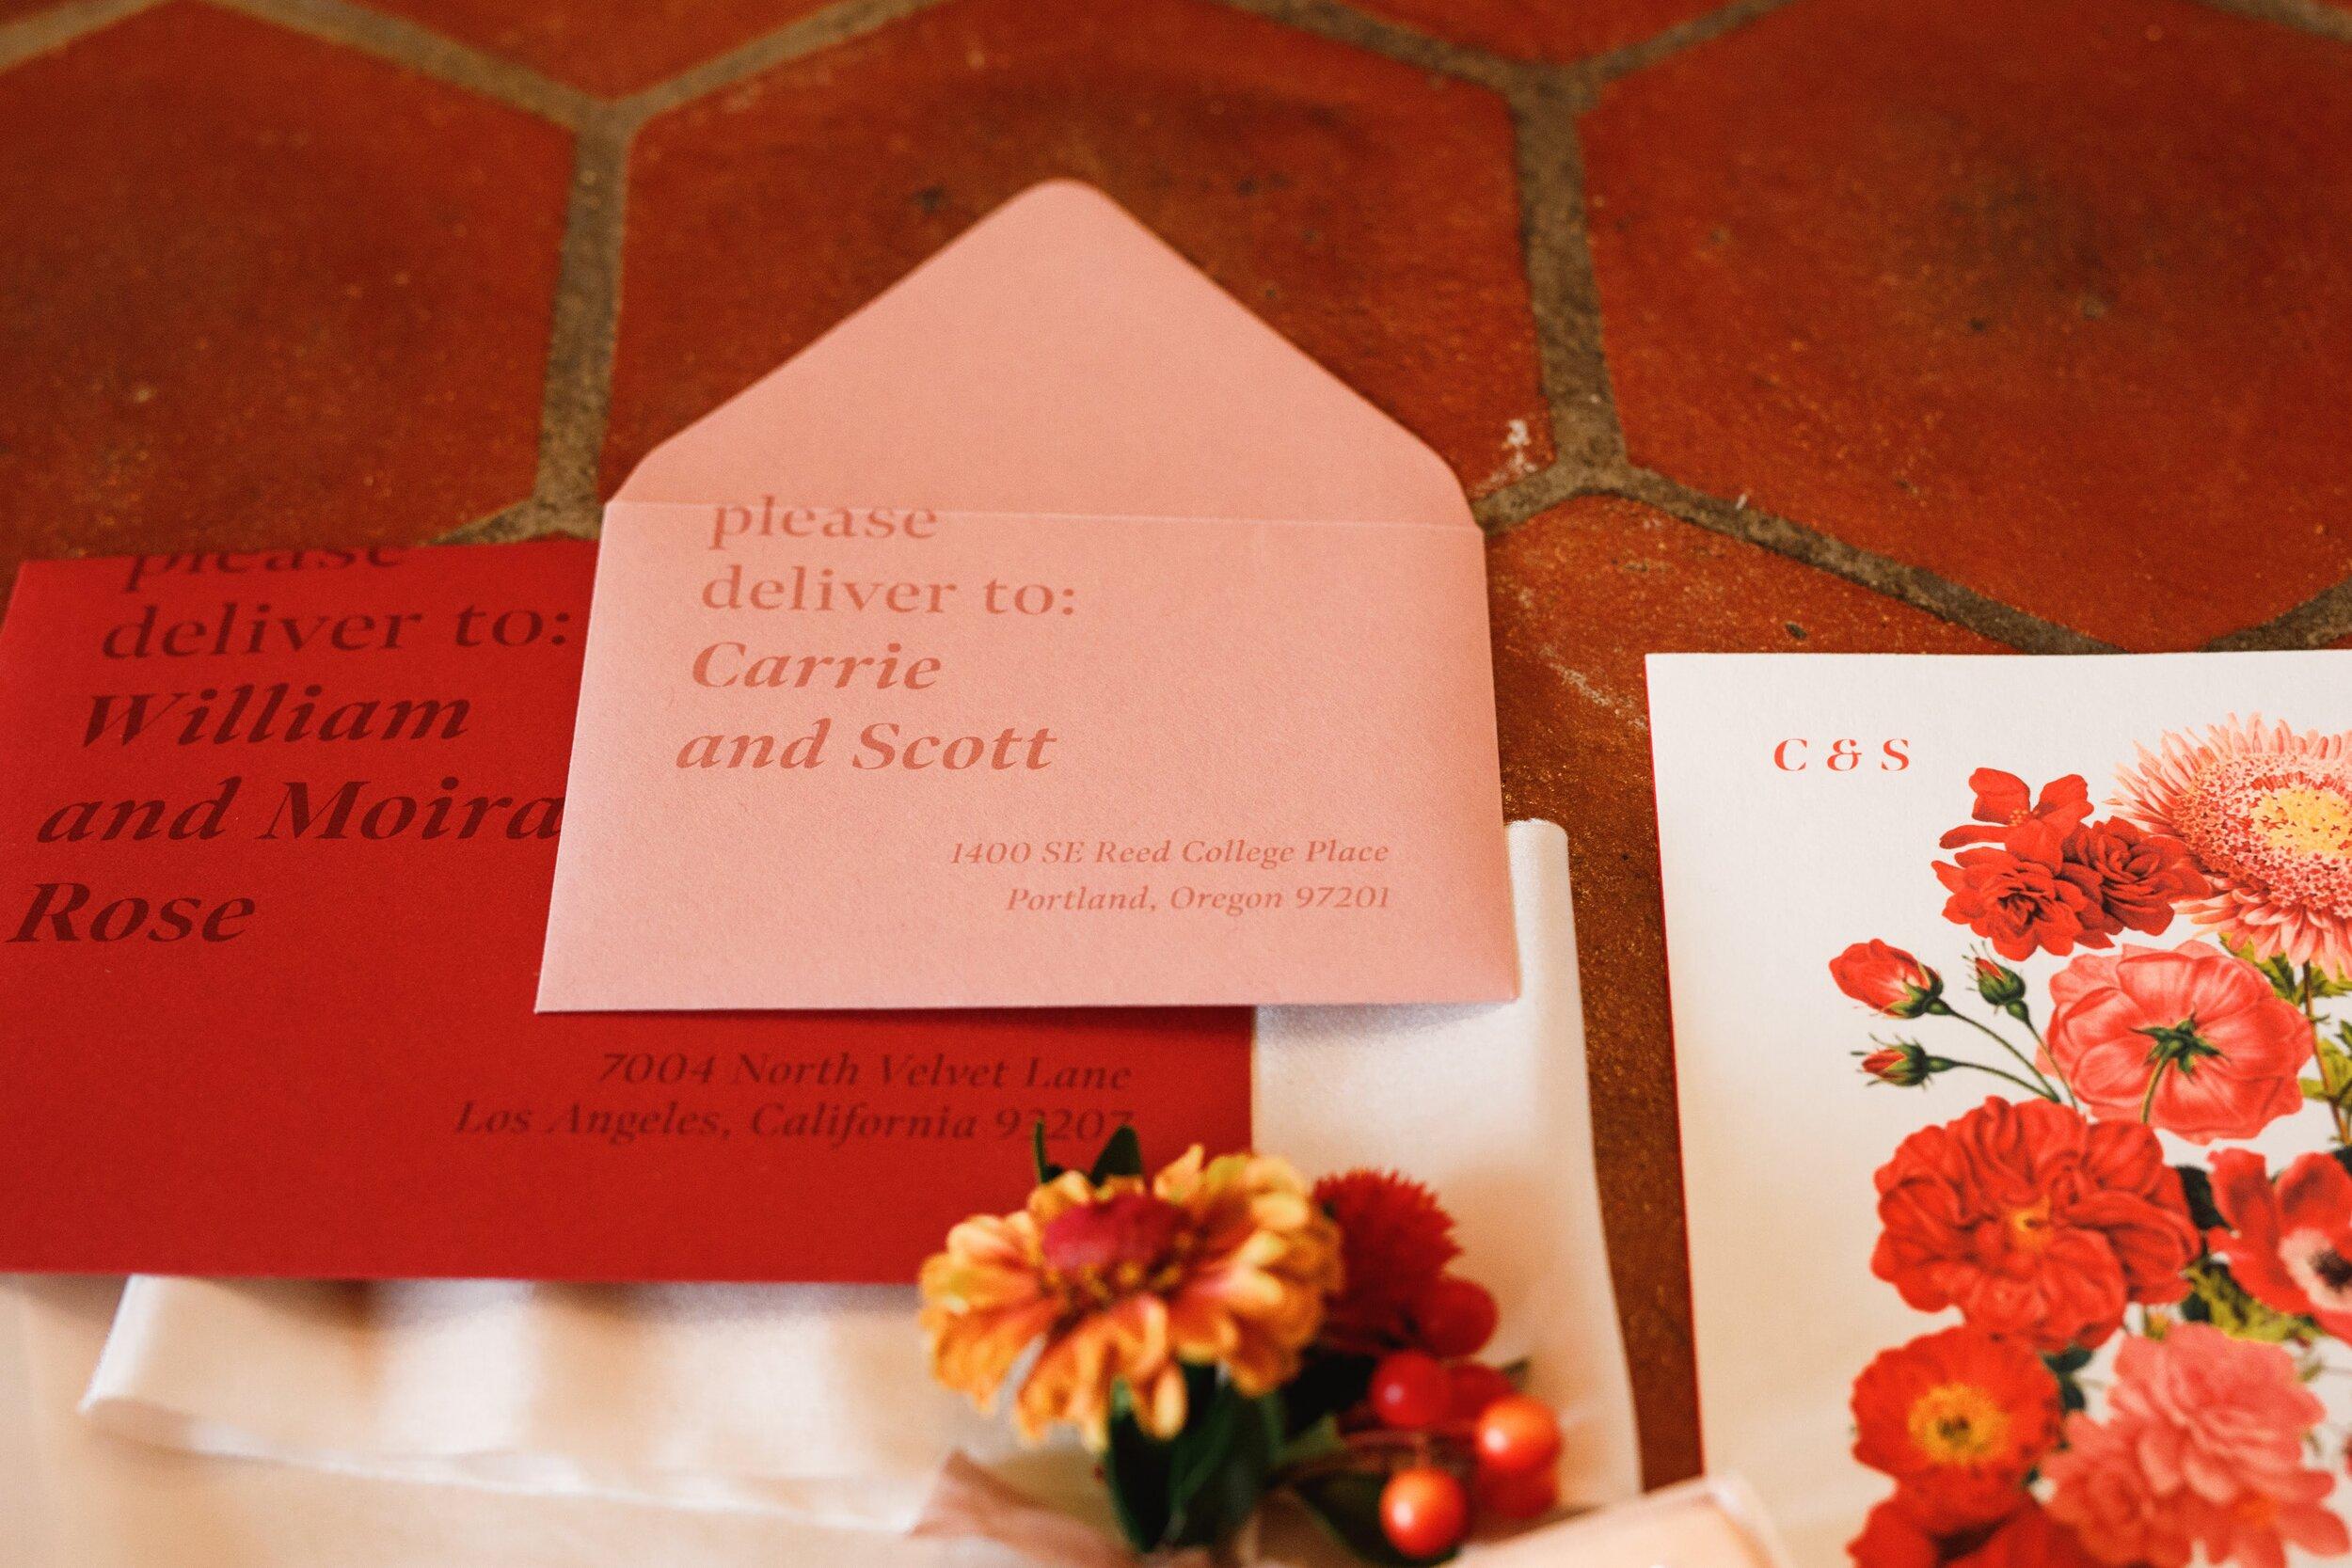 Wisconsin-Villa-Terrace-Hall-Creative-Co-Custom-Wedding-Invitations.jpg